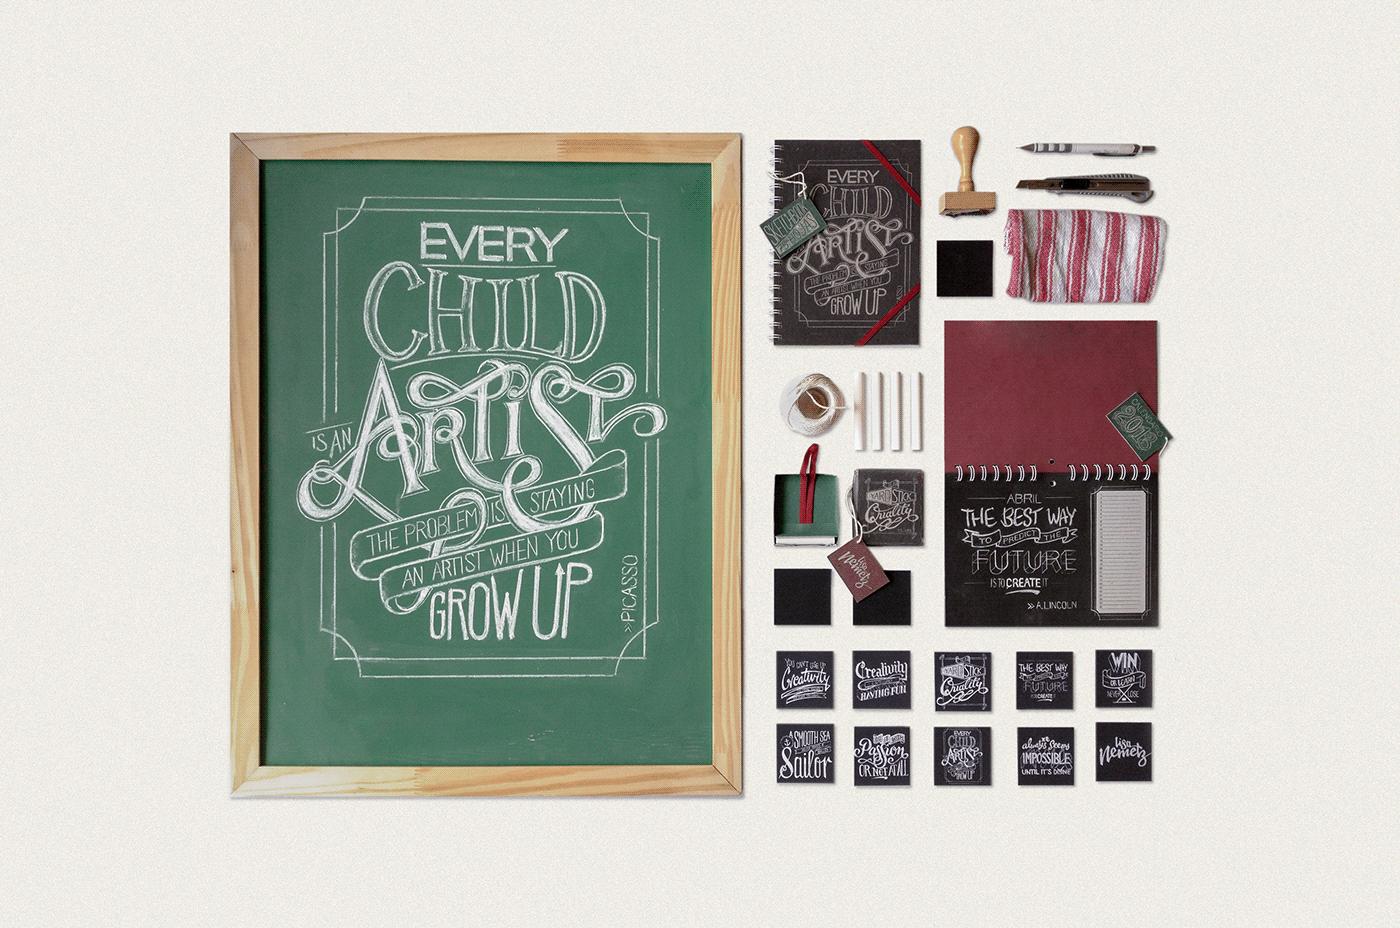 Adobe Portfolio Chalkboard chalk quote future Stationery blackboard calendar Creativity innovation lettering magnets notebook paper goods sketchbook type